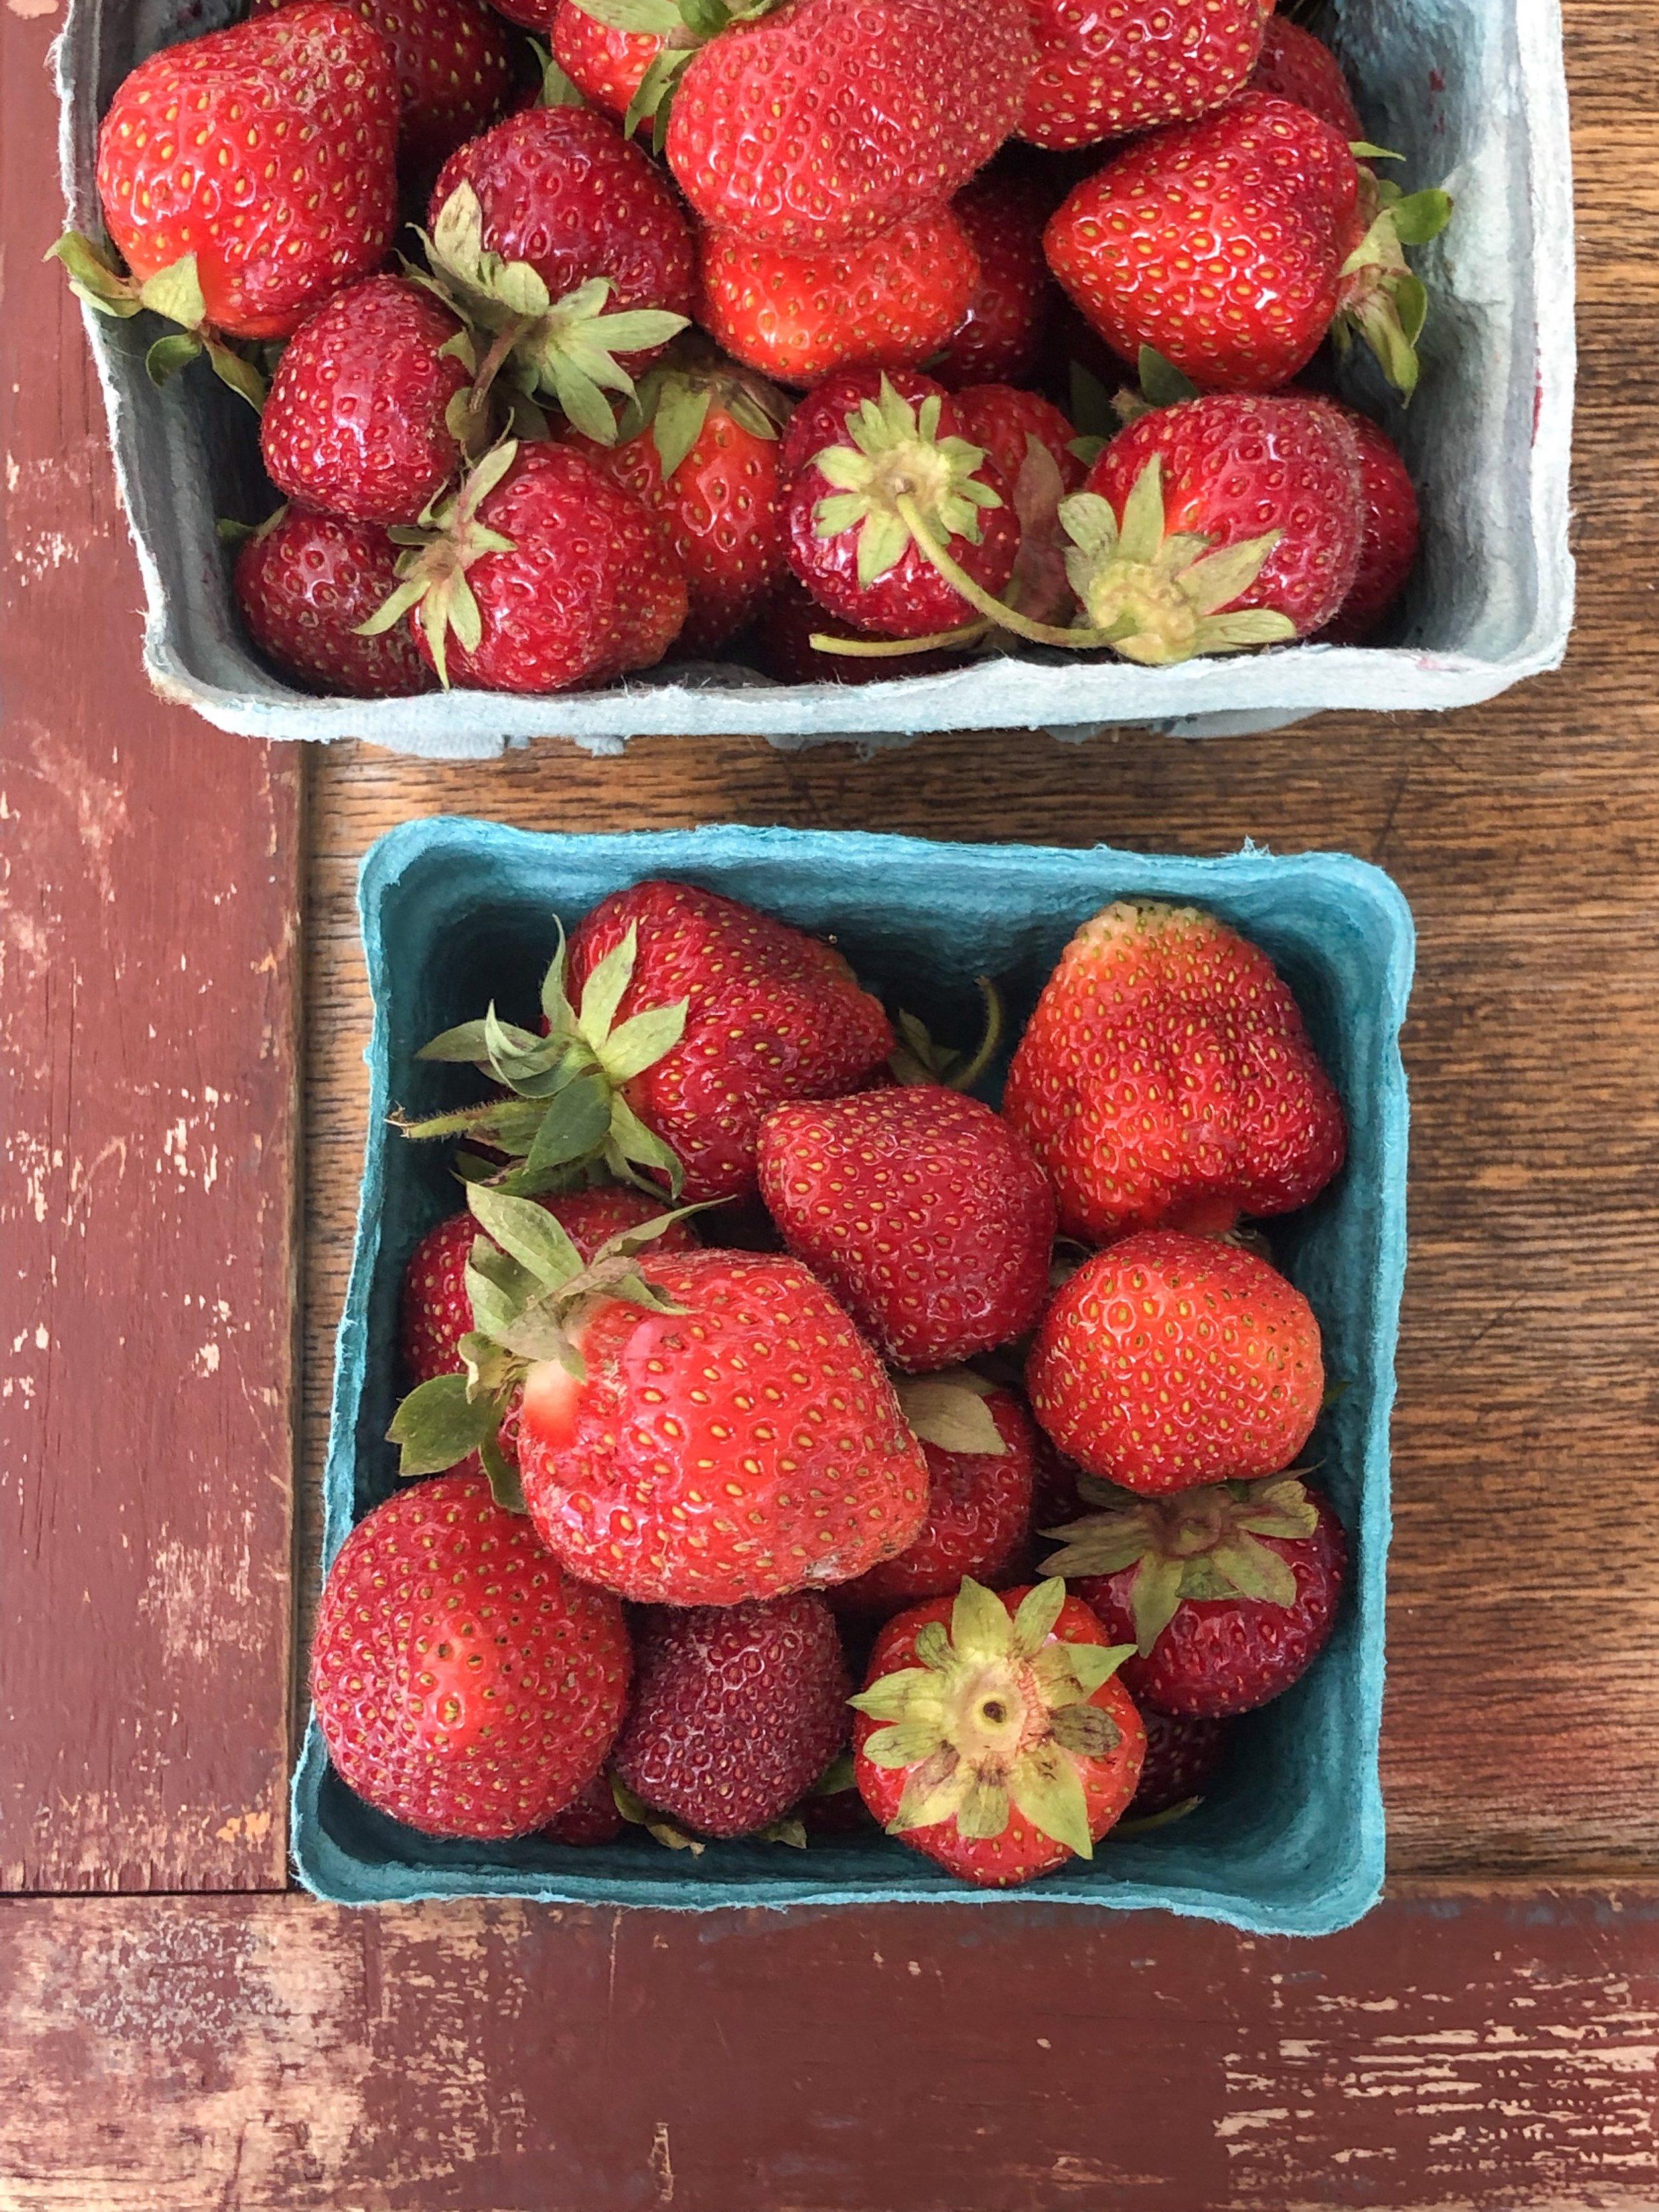 Farmers Market Strawberries 2.jpg